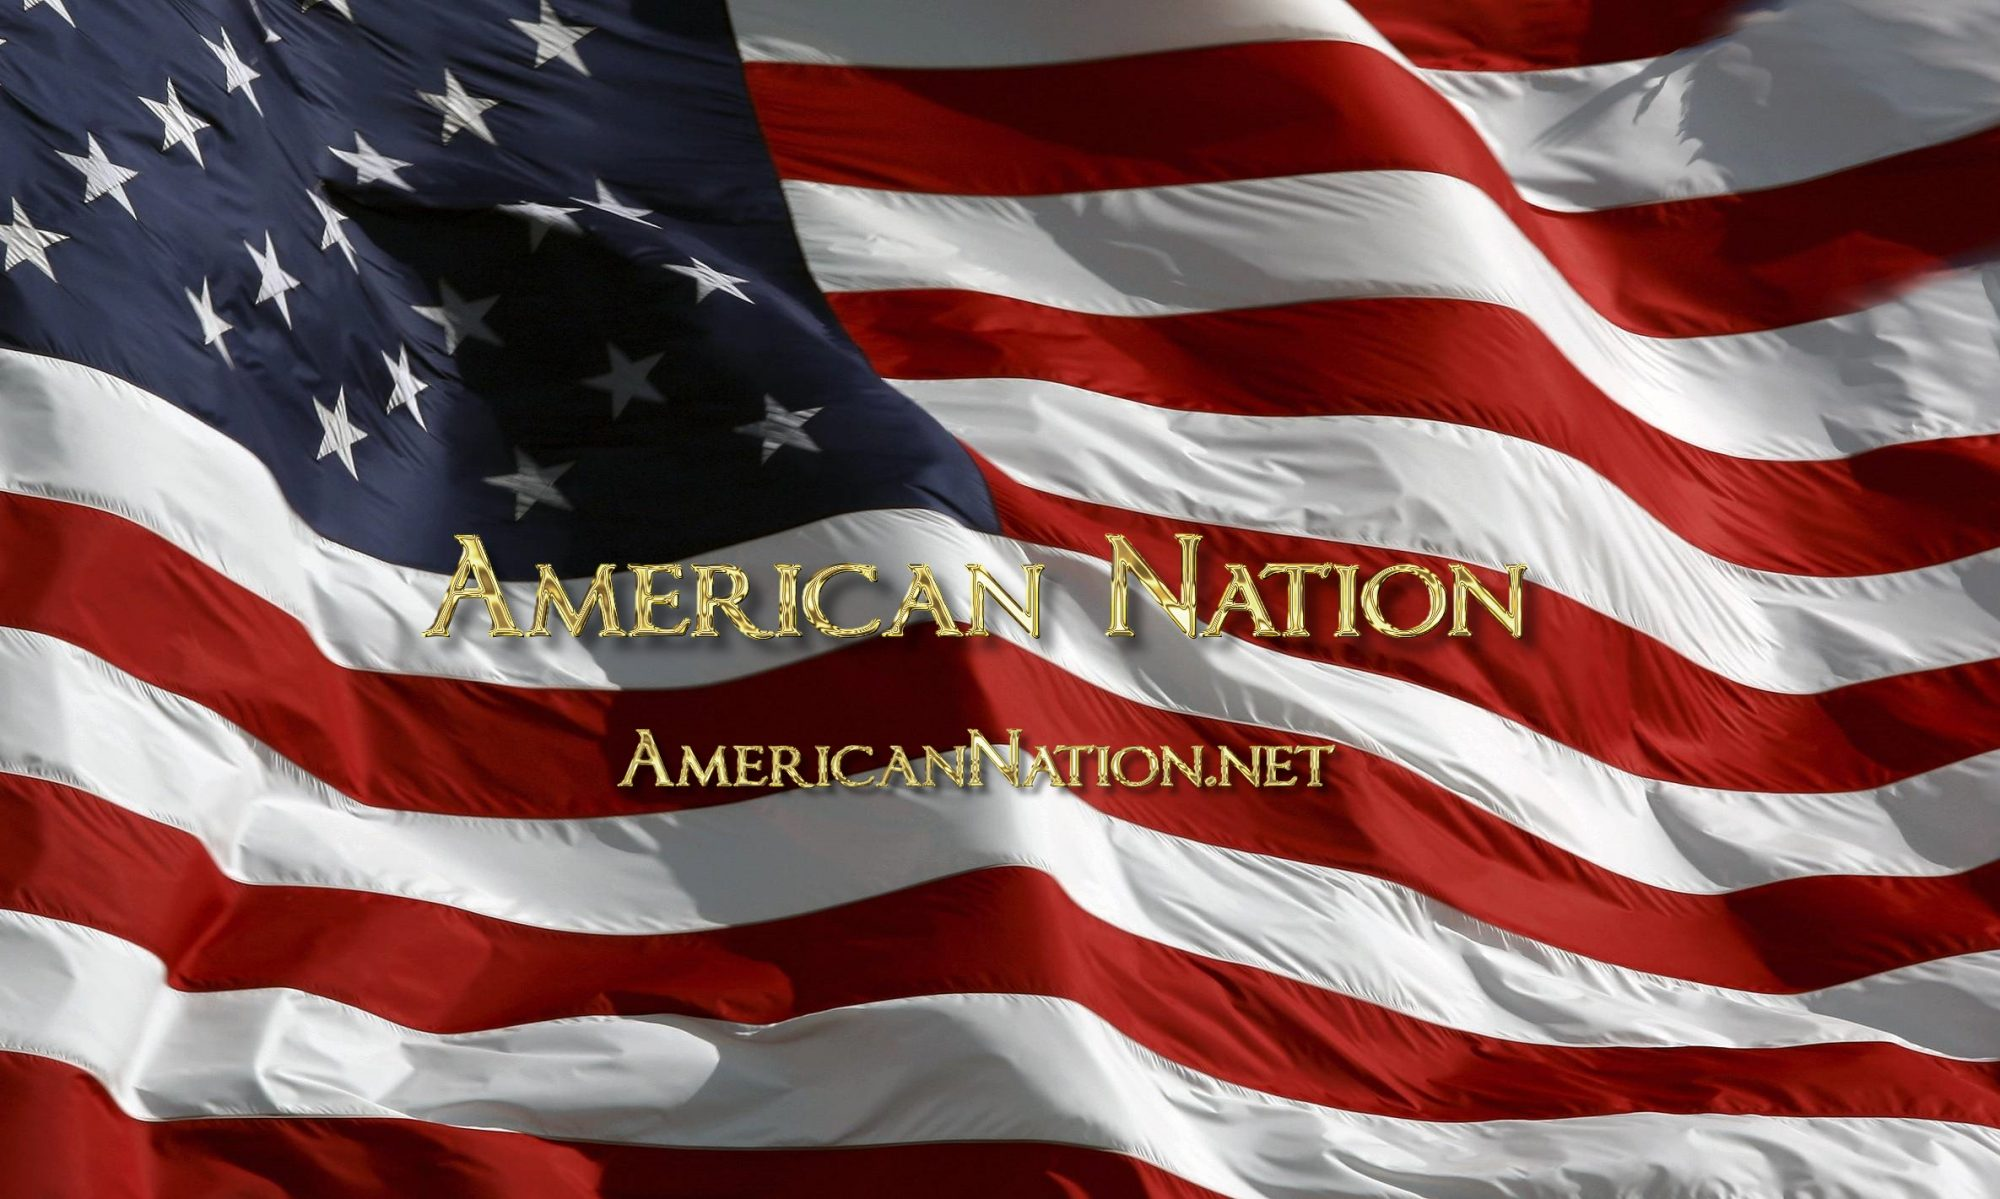 AmericanNation.net